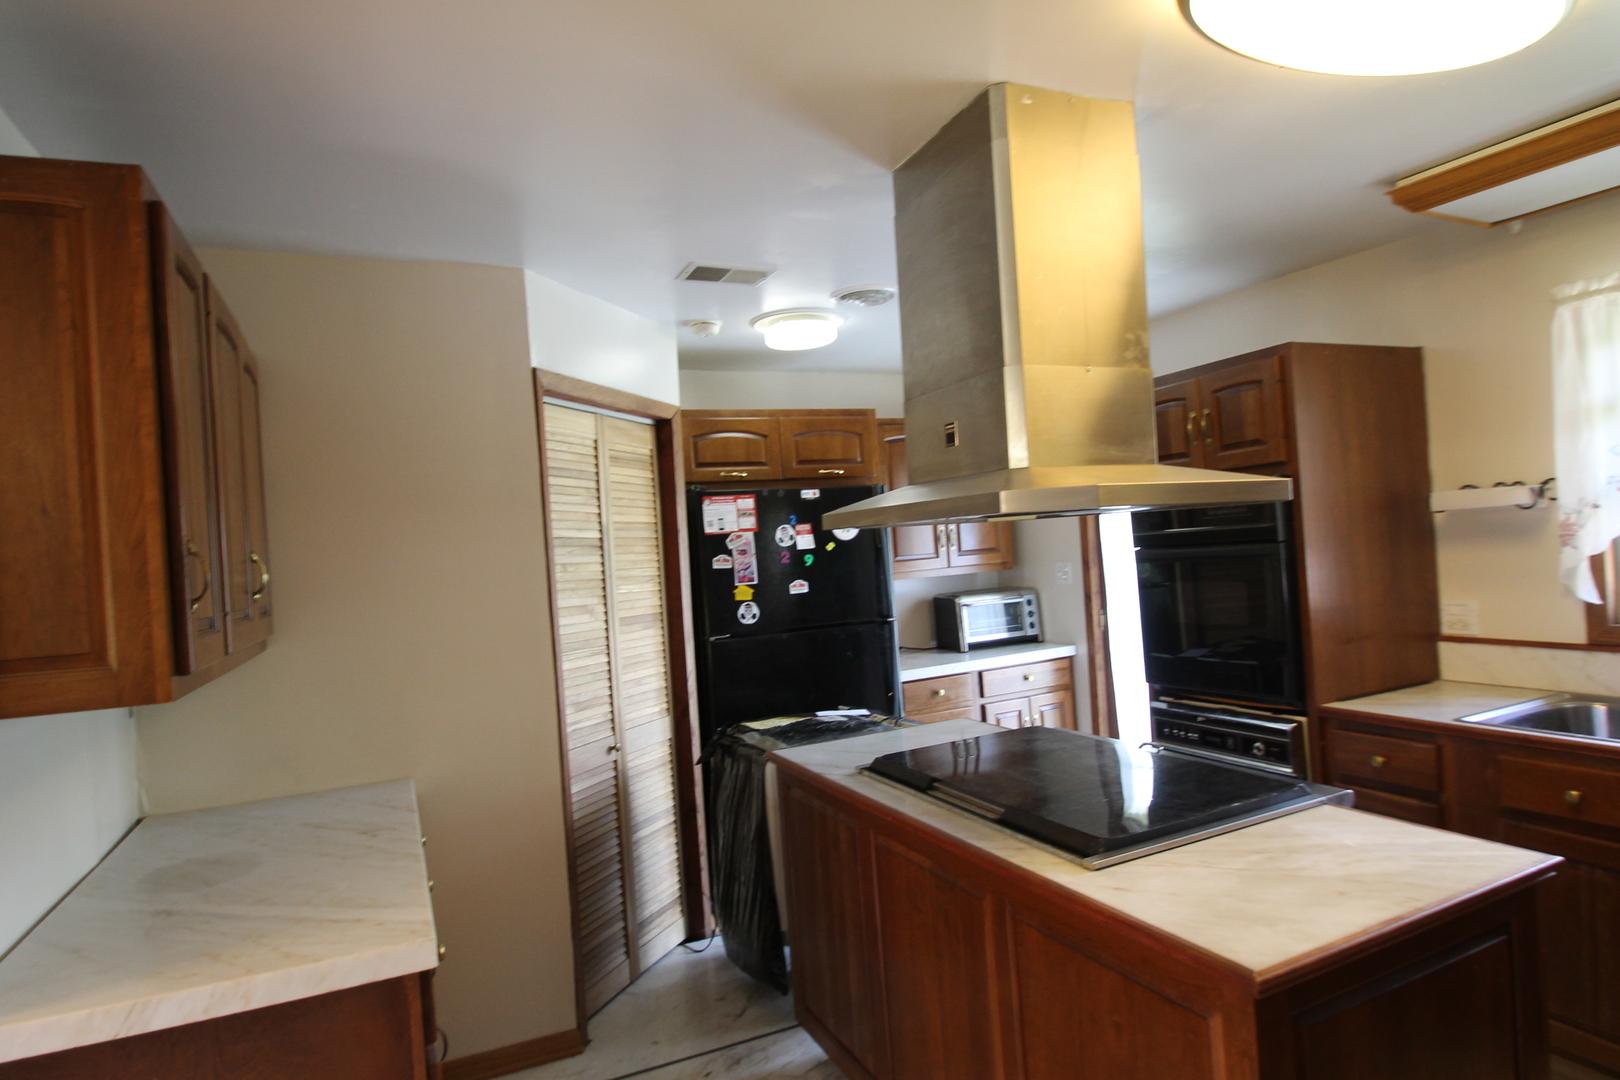 37633 North Frank, Spring Grove, Illinois, 60081